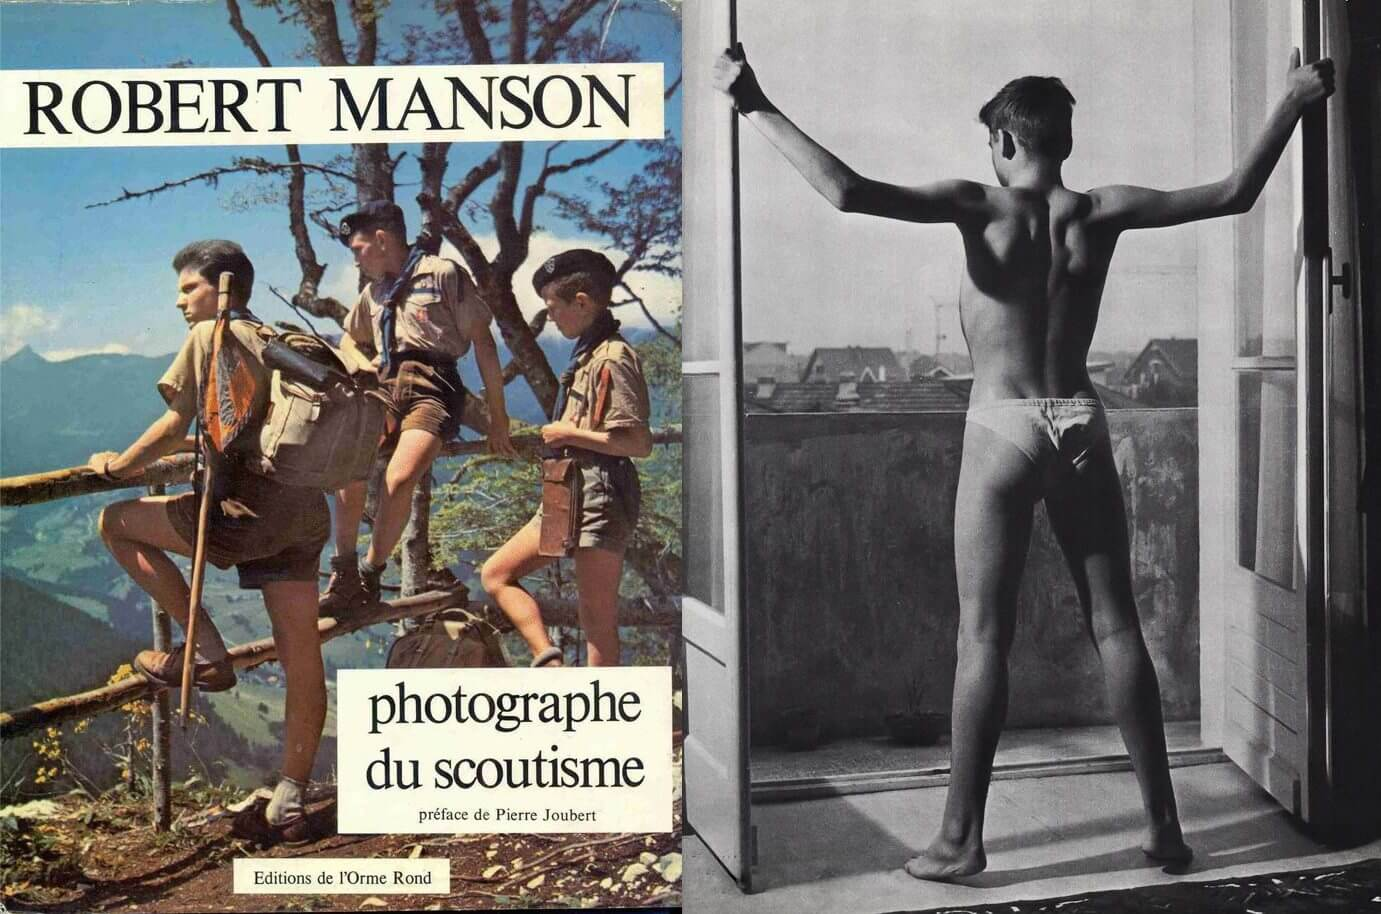 scout e omosessualità Robert Manson